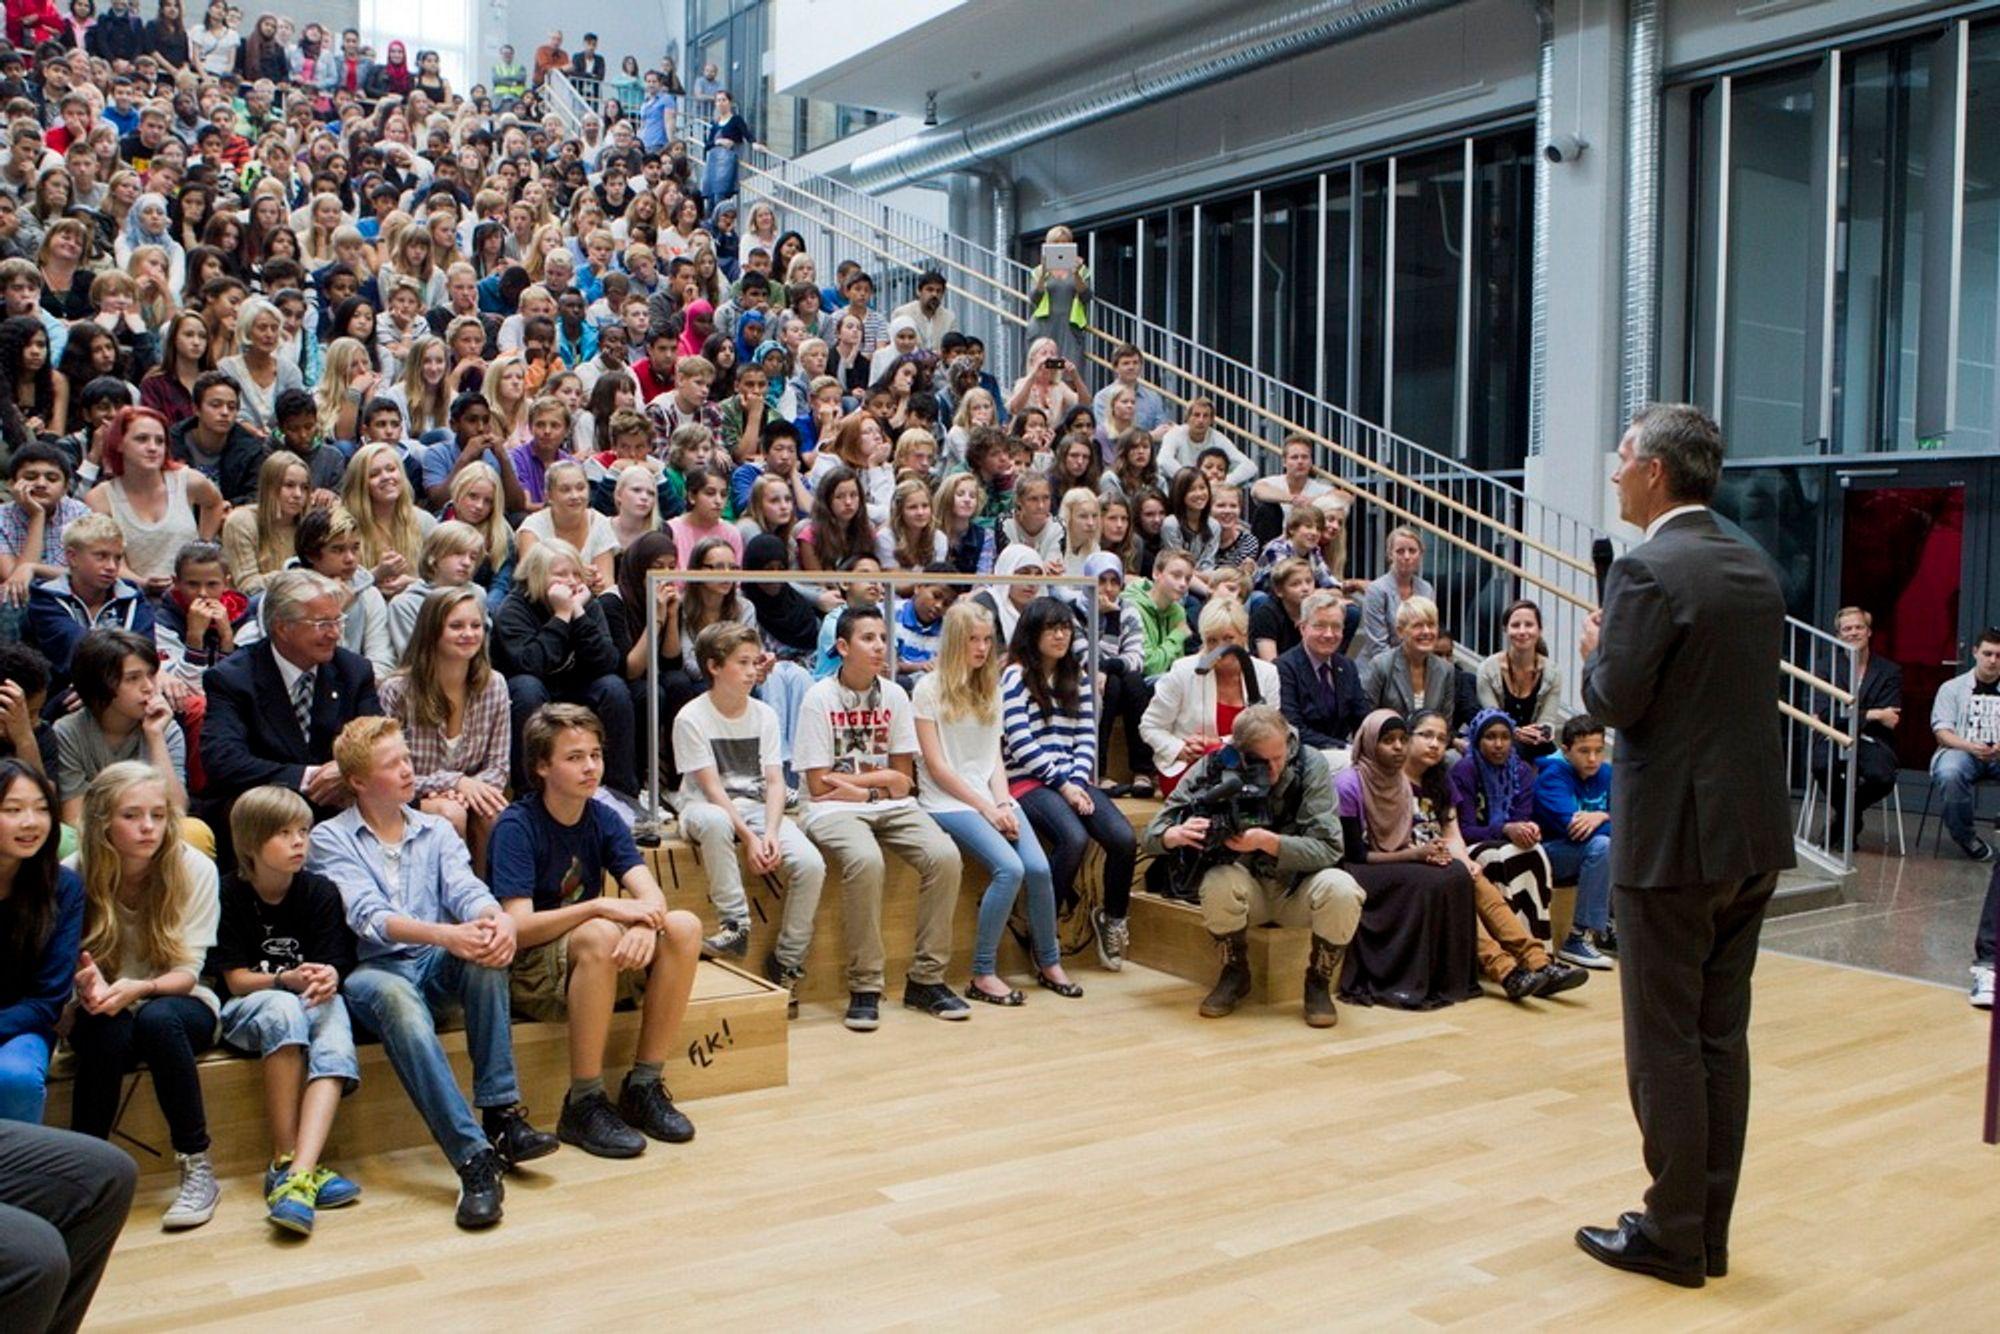 Statsminister Jens Stoltenberg (Ap) fortalte om sine matteproblemer som skoleelev på alle trinn da han ønsket velkommen til første skoledag på Frydenberg skole i Oslo mandag.